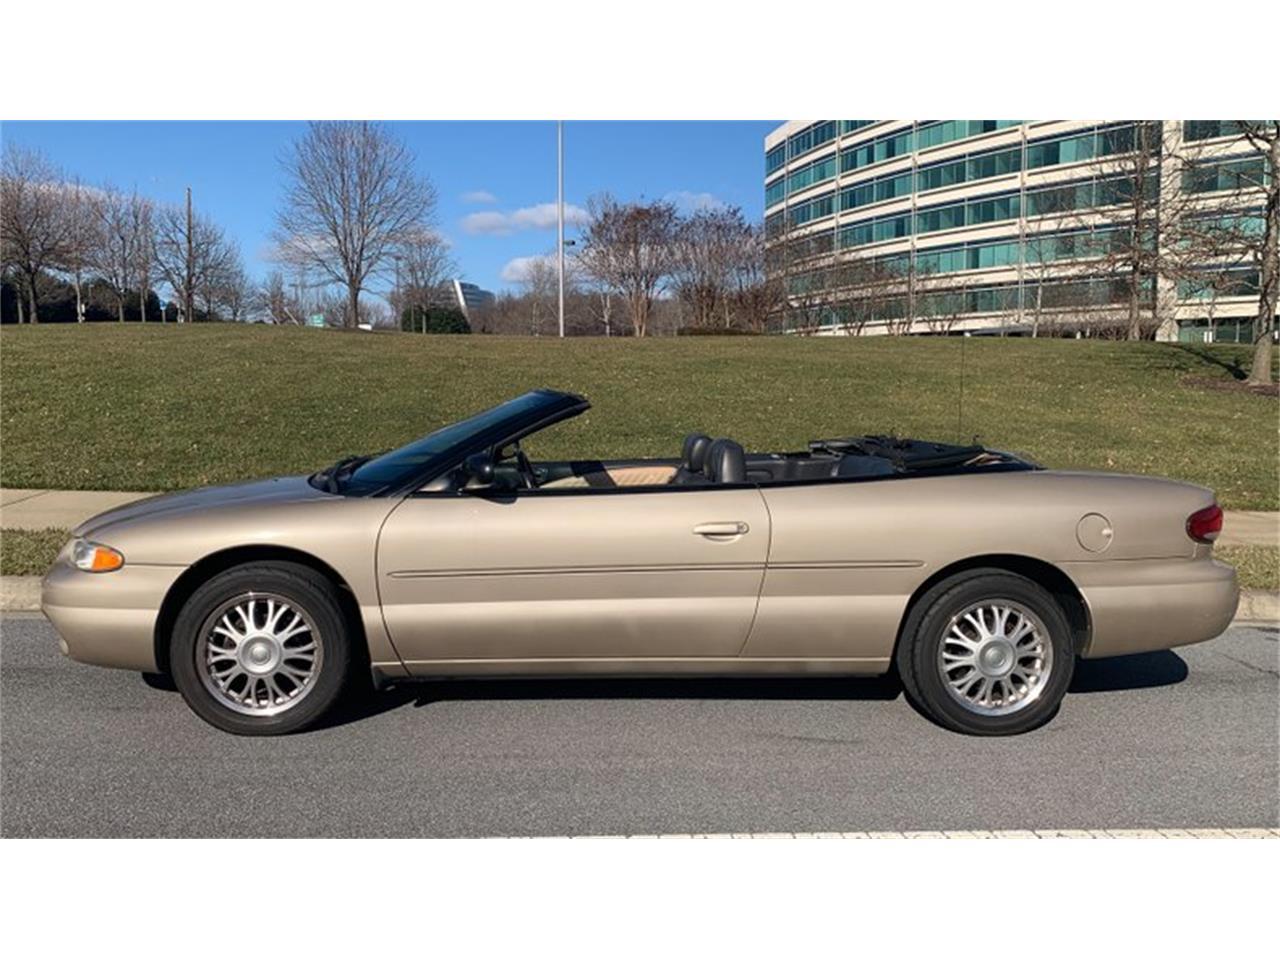 For Sale: 1998 Chrysler Sebring in Rockville, Maryland